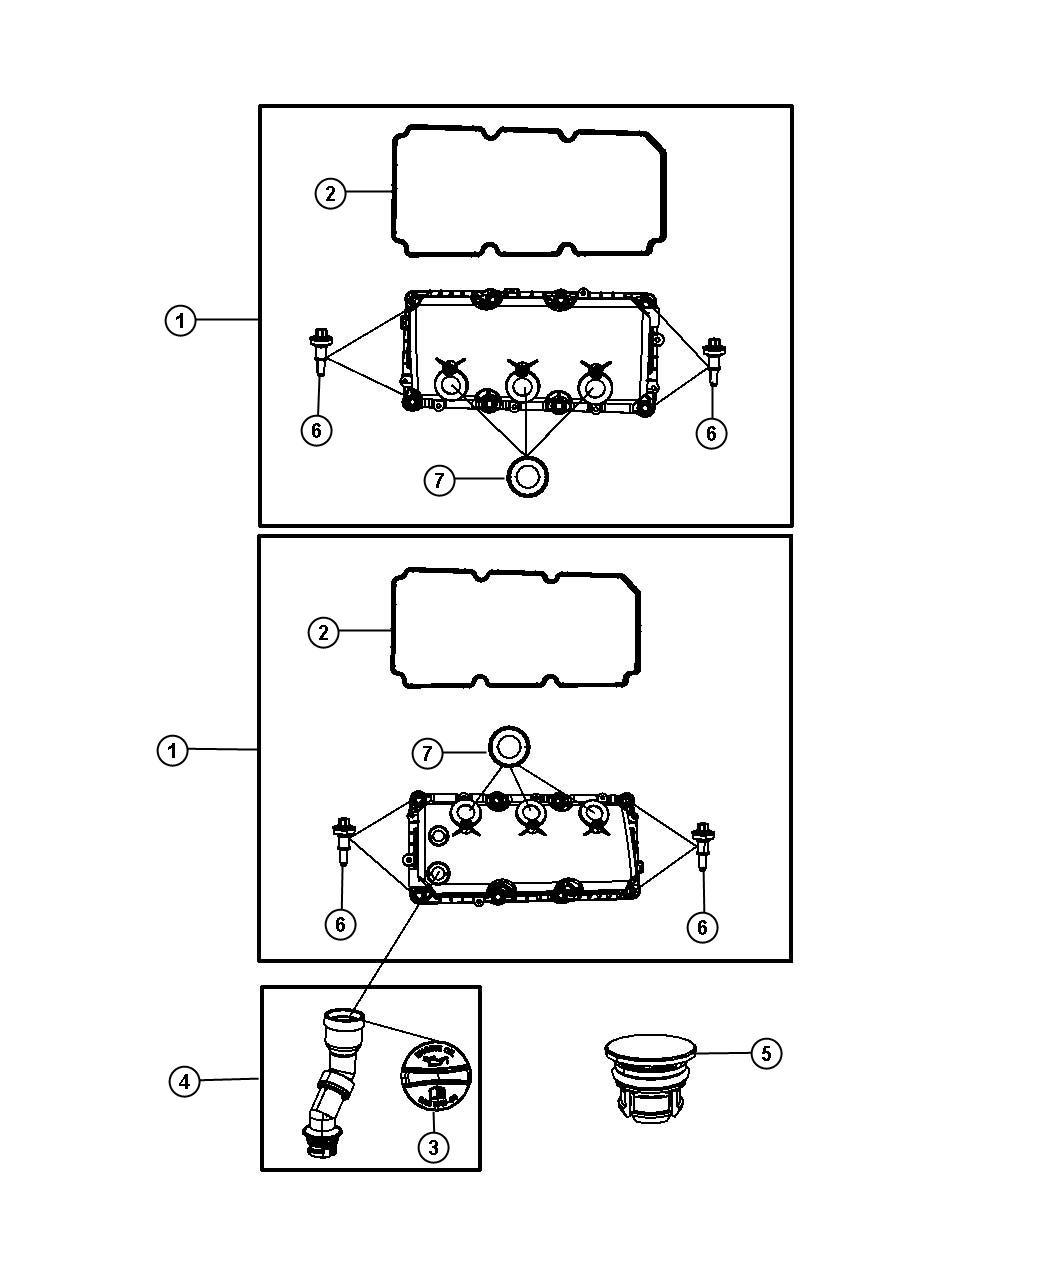 Dodge Grand Caravan Tube. Oil filler. Includes item 3